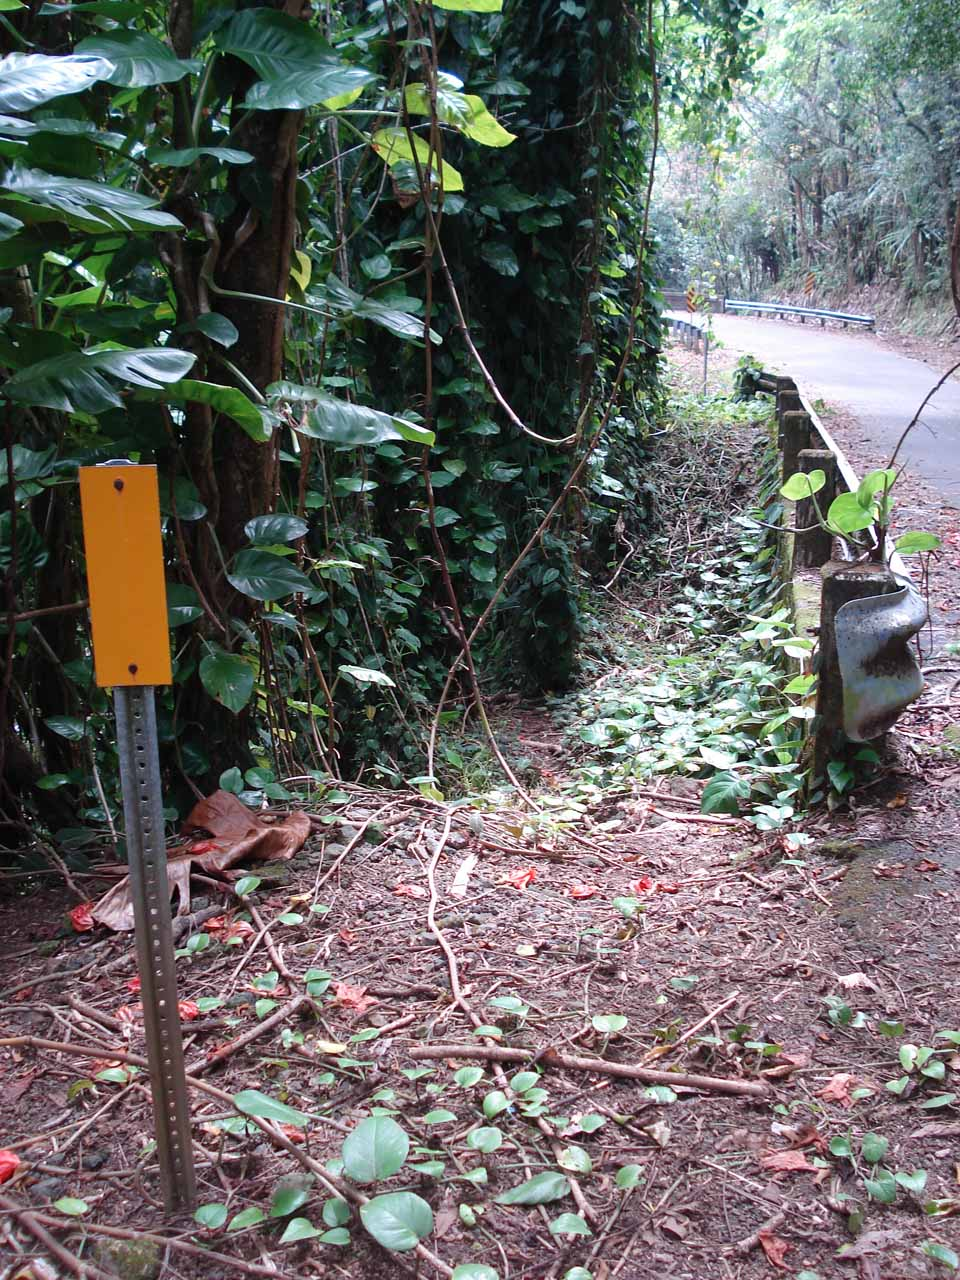 Guardrail near the start of the scramble